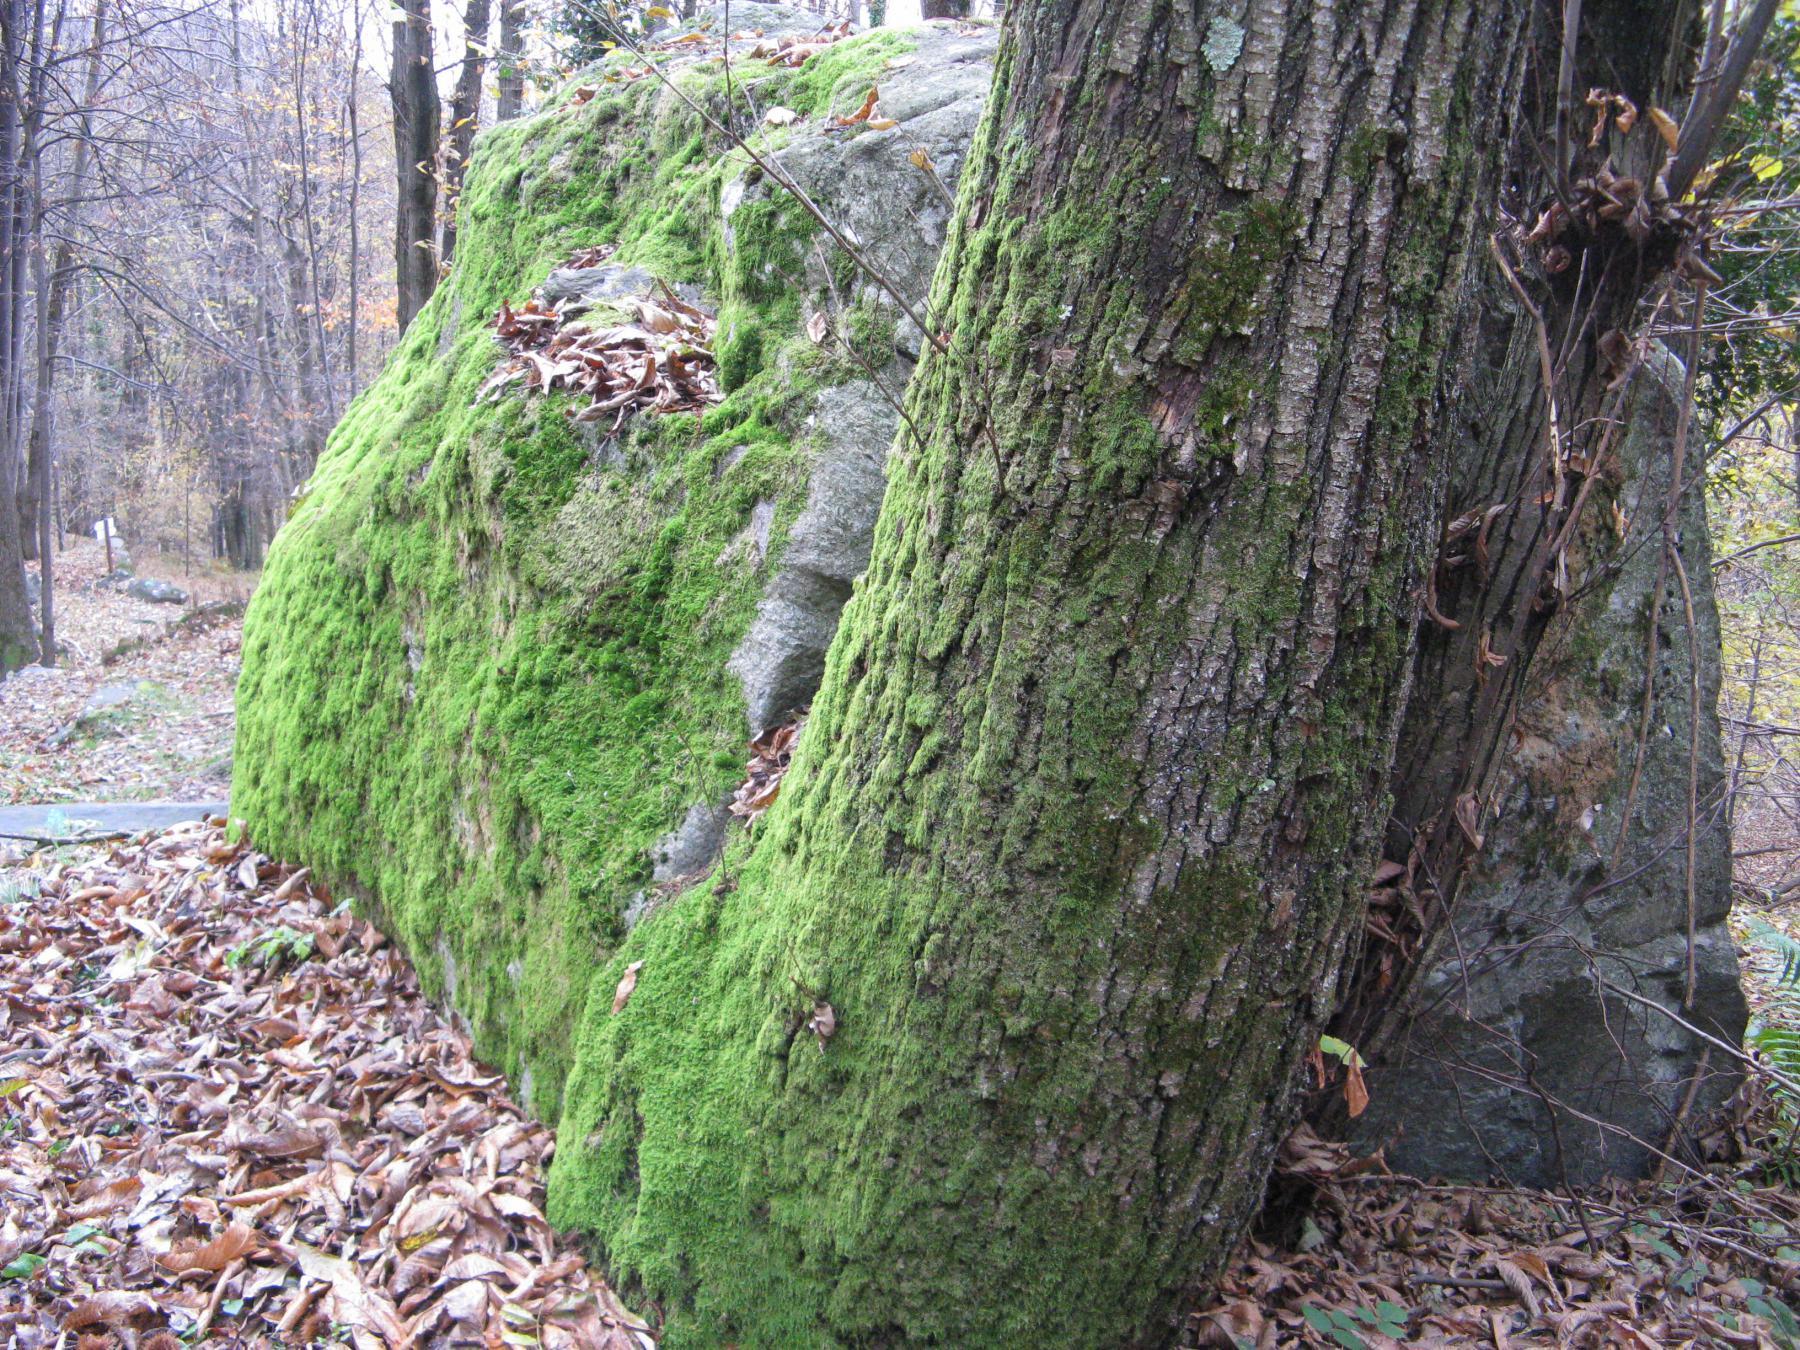 Scorcio del bosco